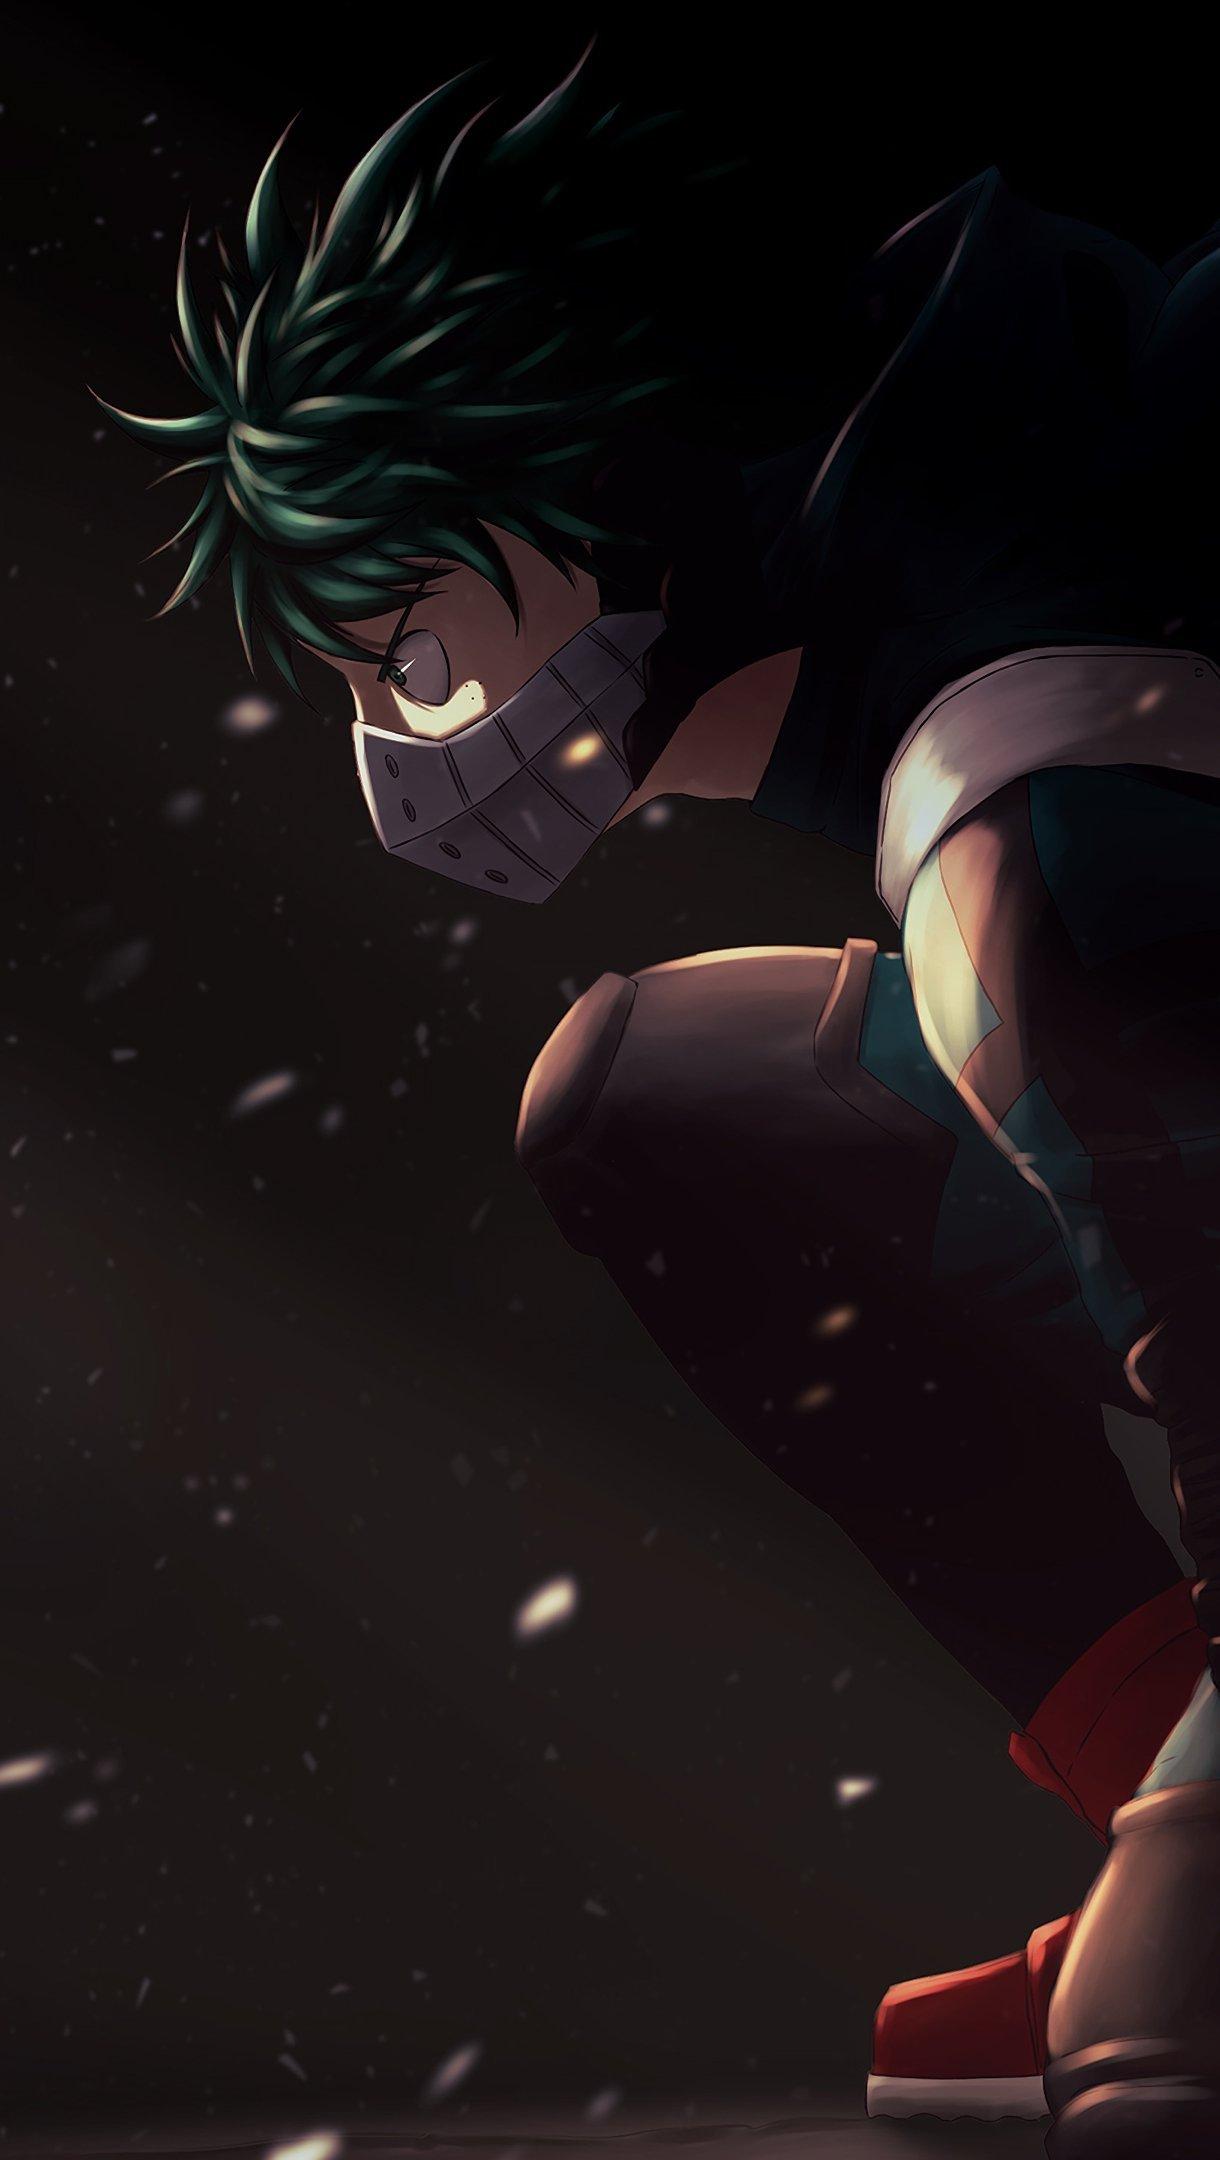 Anime Wallpaper Izuku Midoriya My Hero Academia Vertical